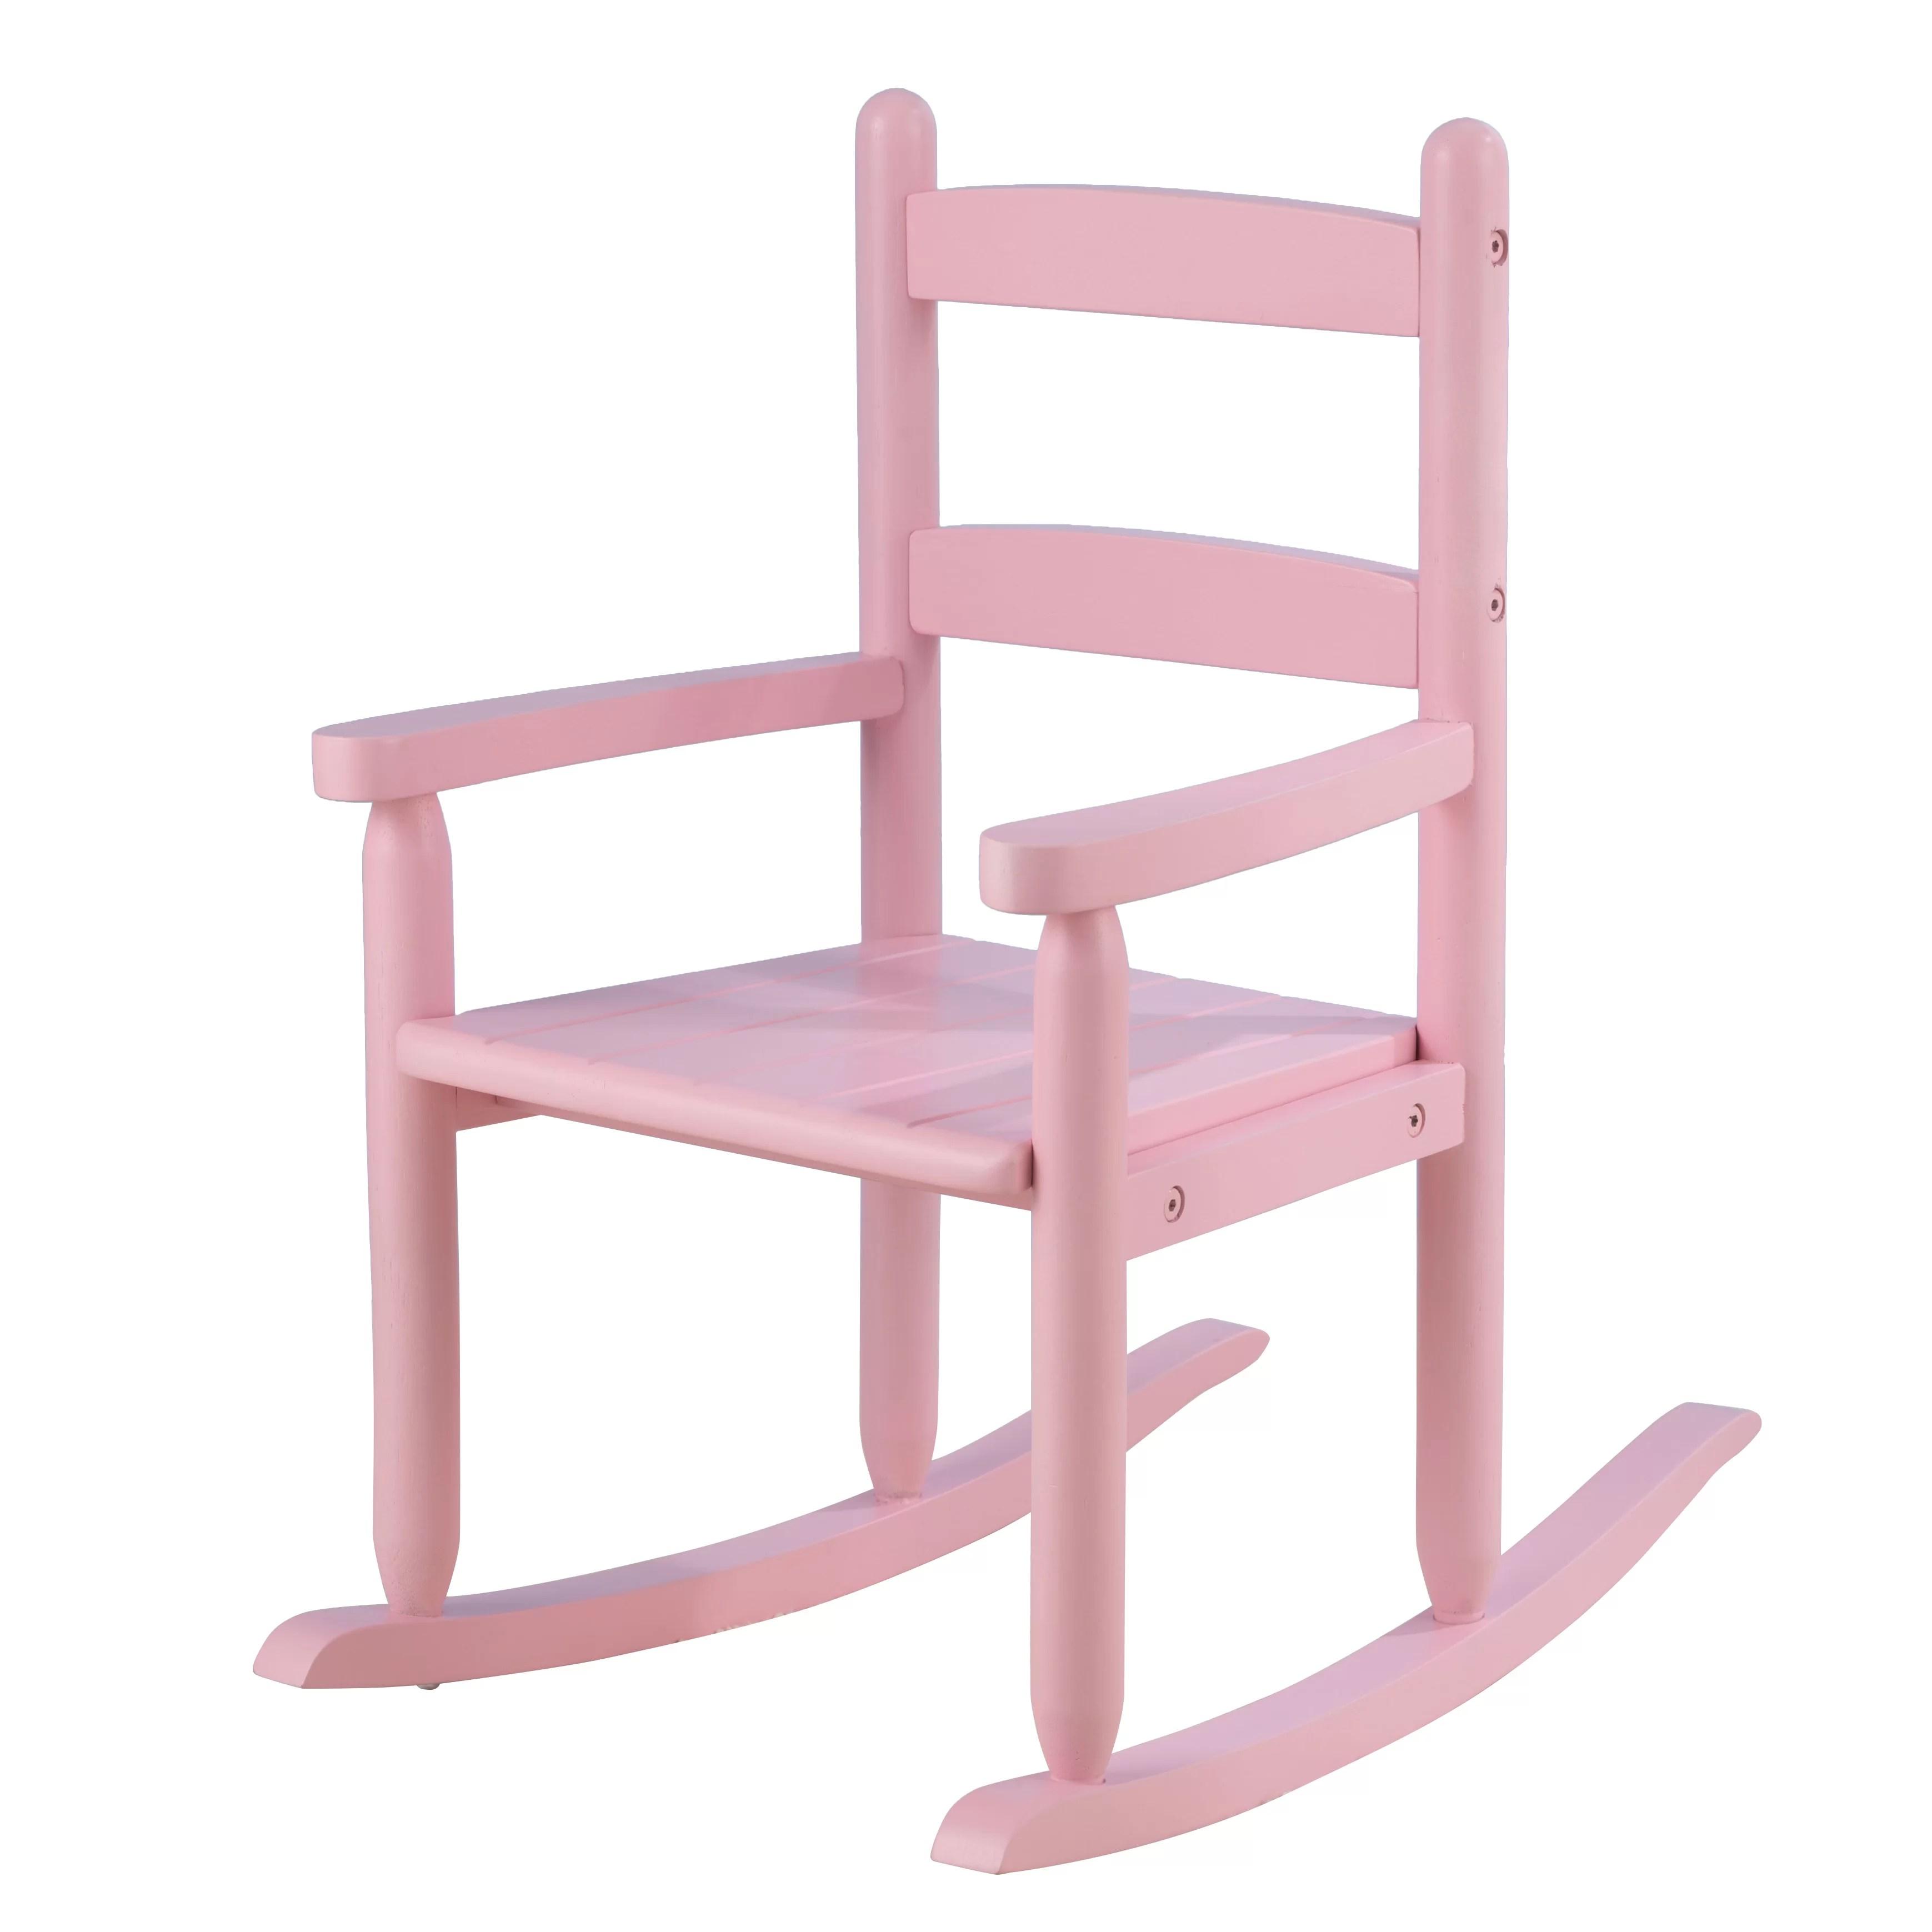 rocking chair kids saddle with back support kidkraft 2 slat reviews wayfair